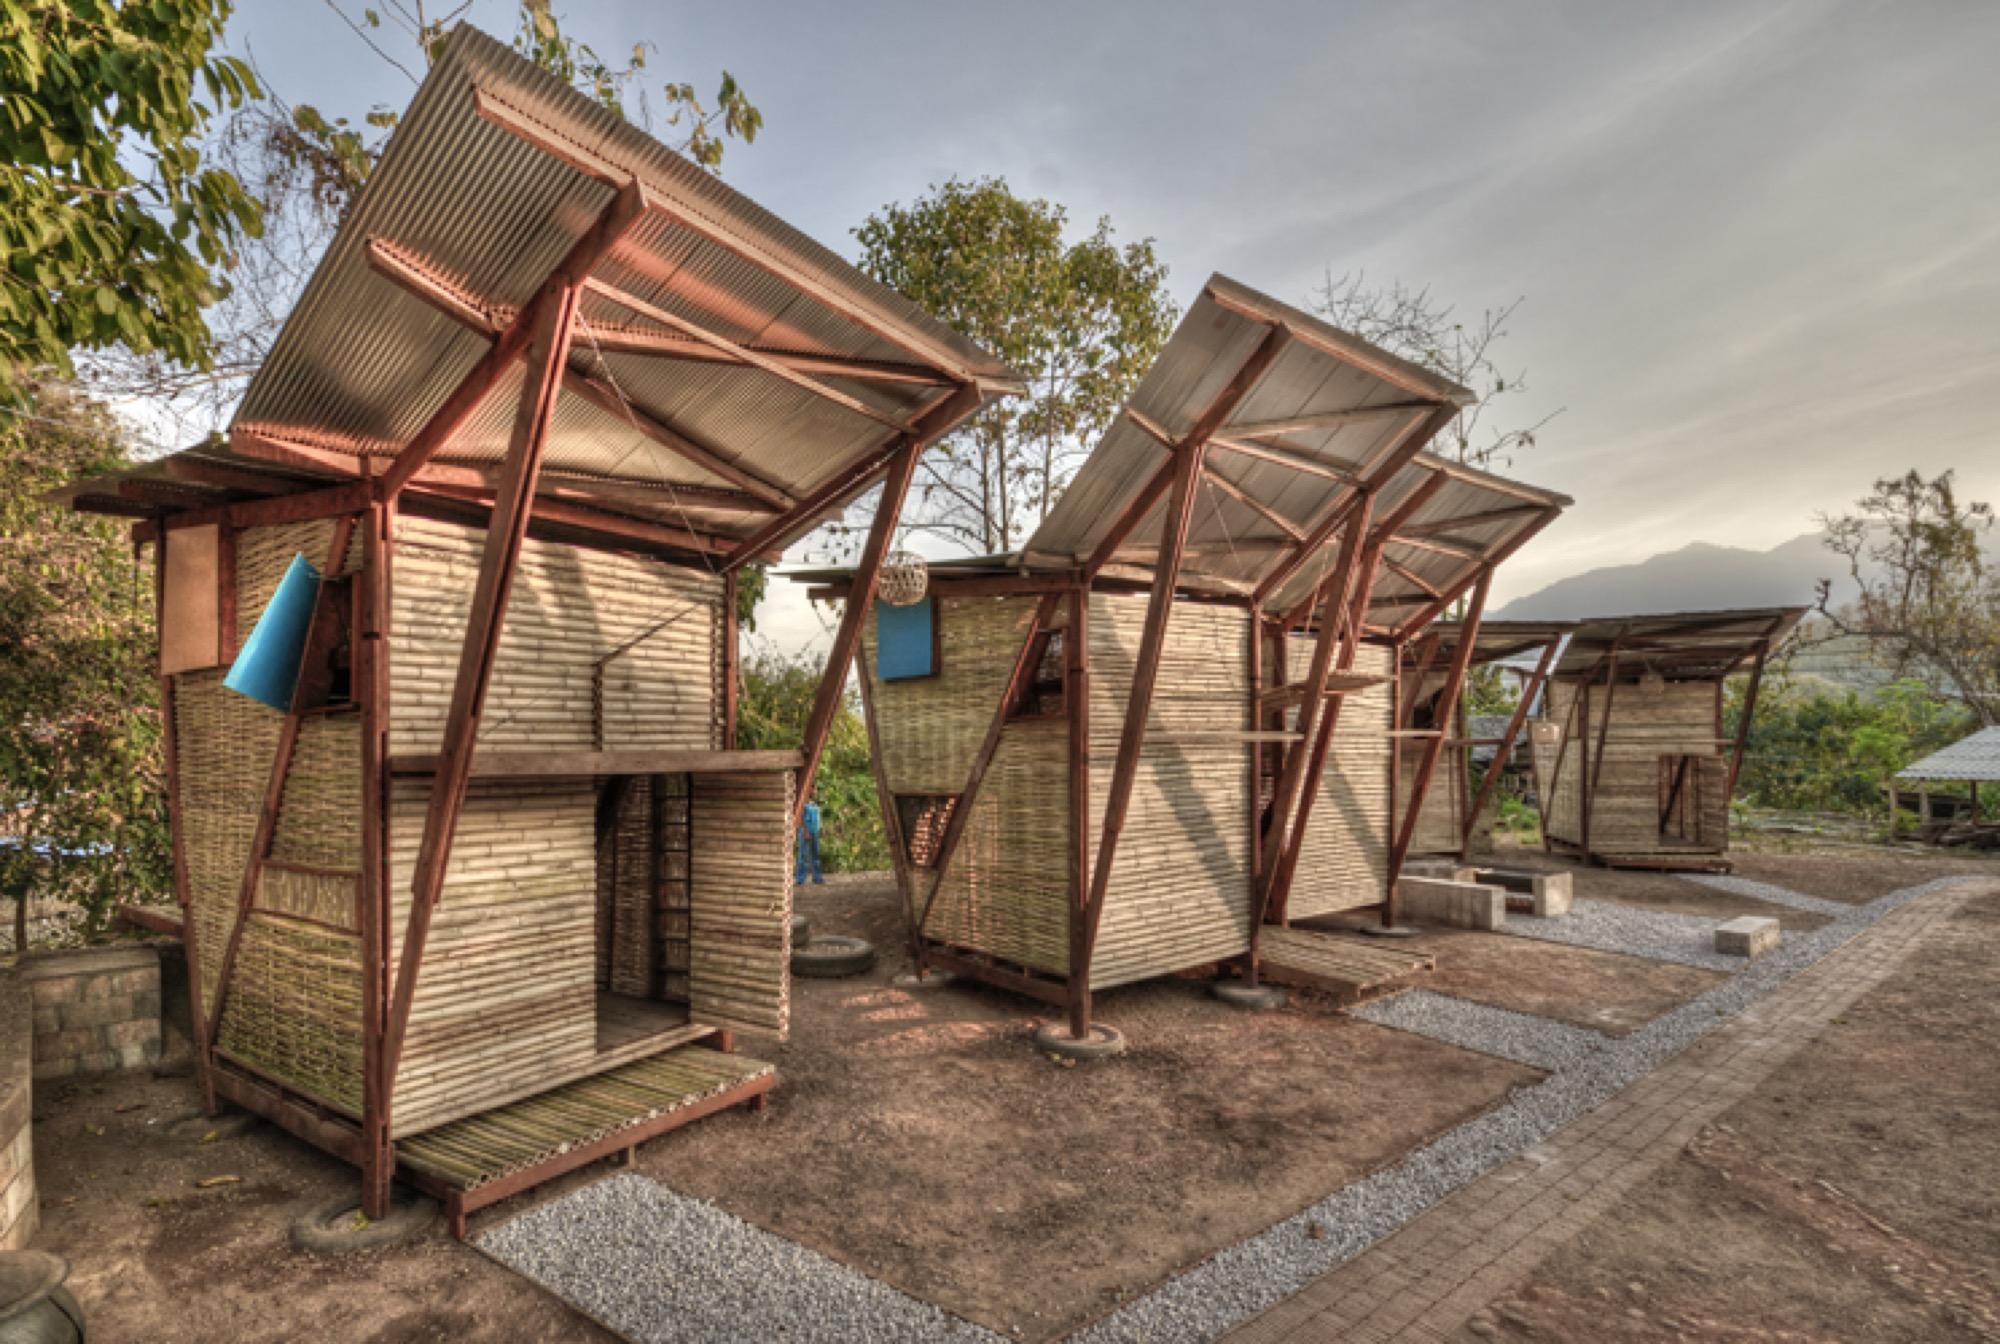 Soe Ker Tie House in Thailand / Photo by Pasi Aalto / Tyin Tegnestue